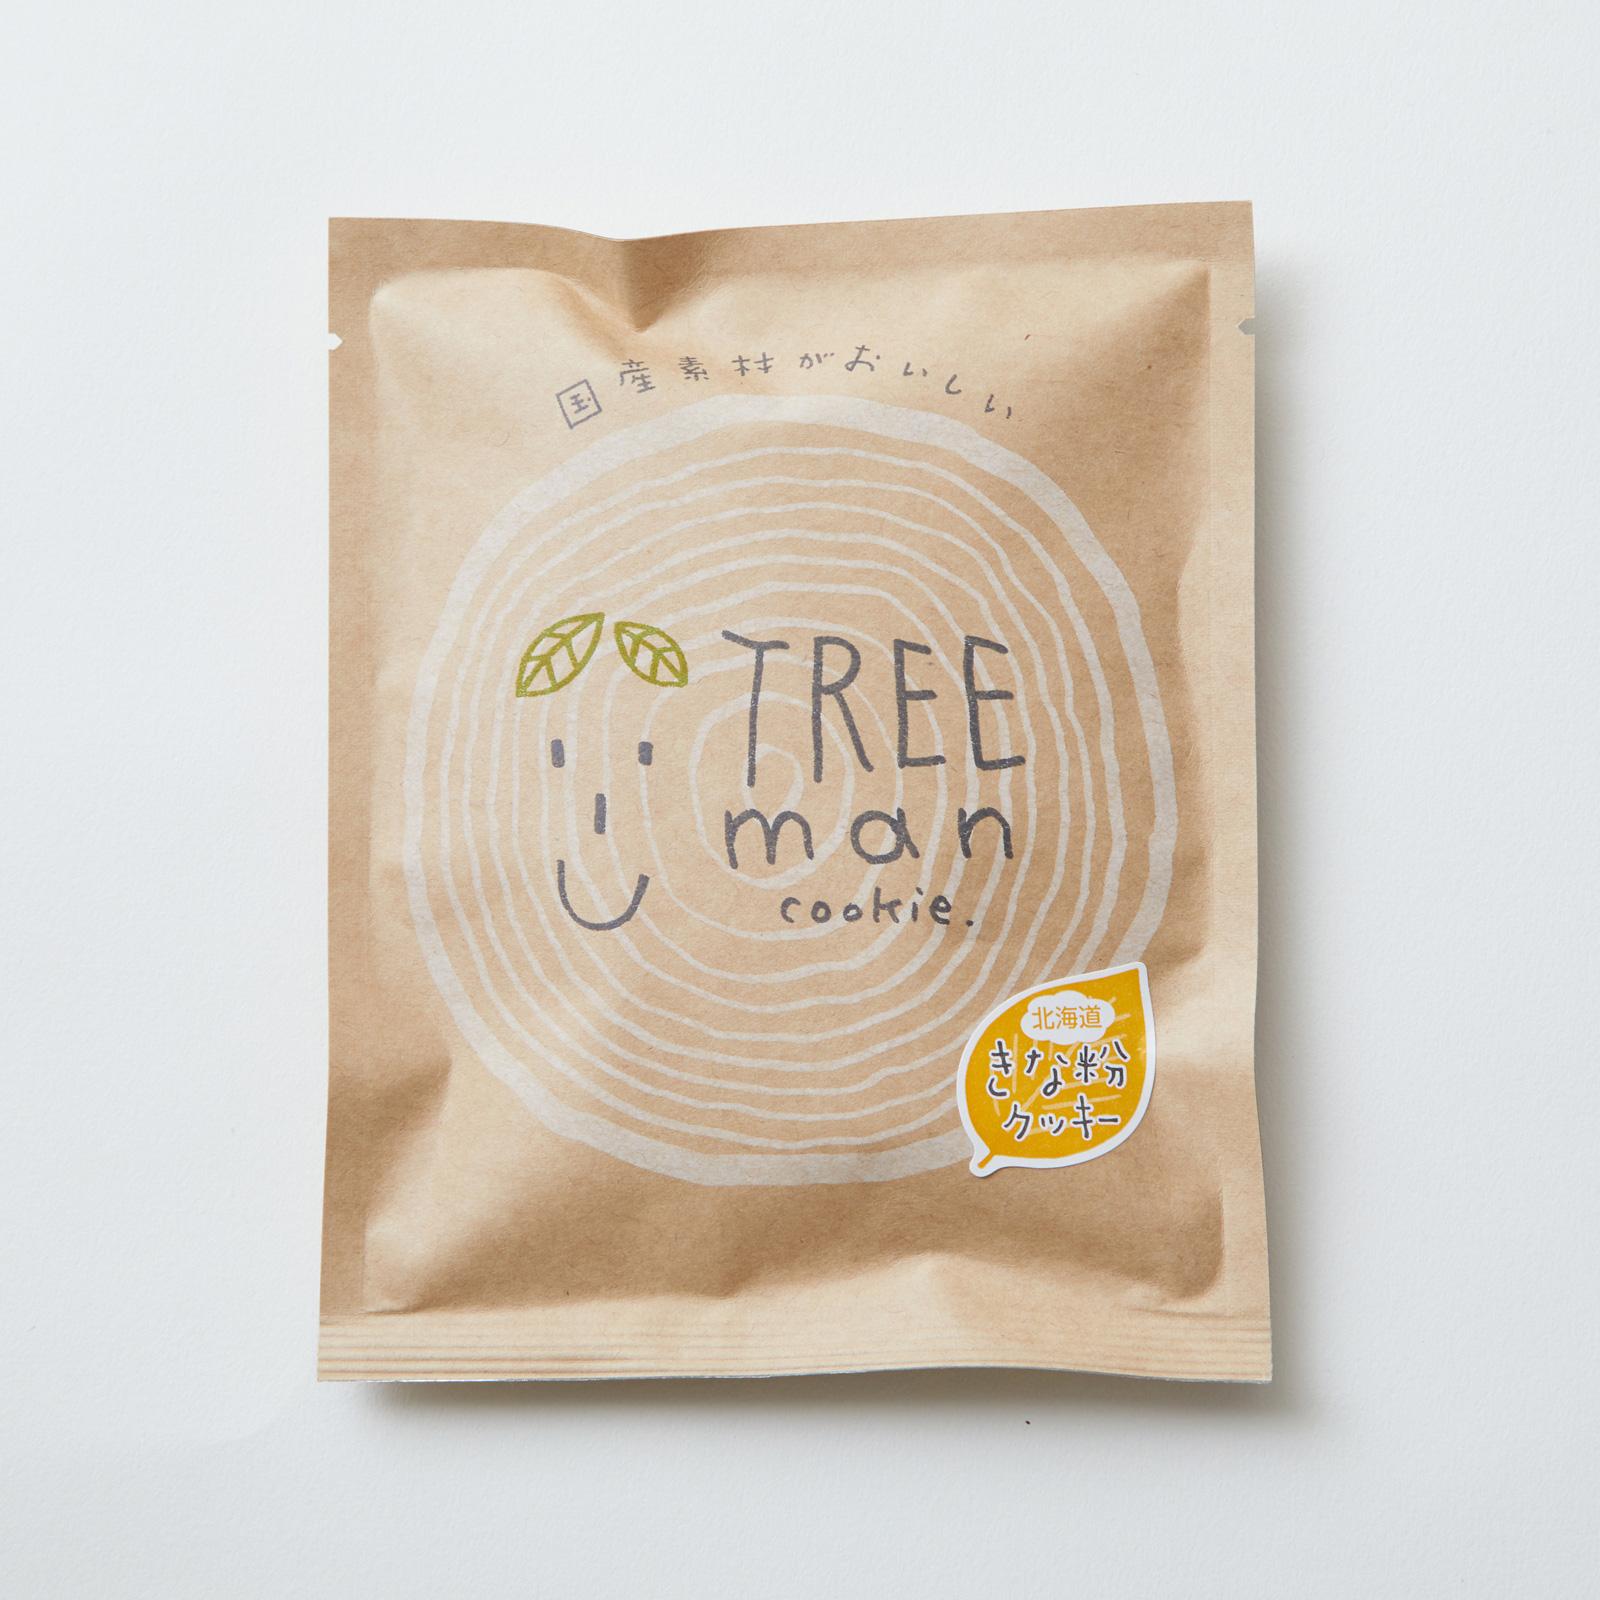 TREEman 北海道きな粉クッキー